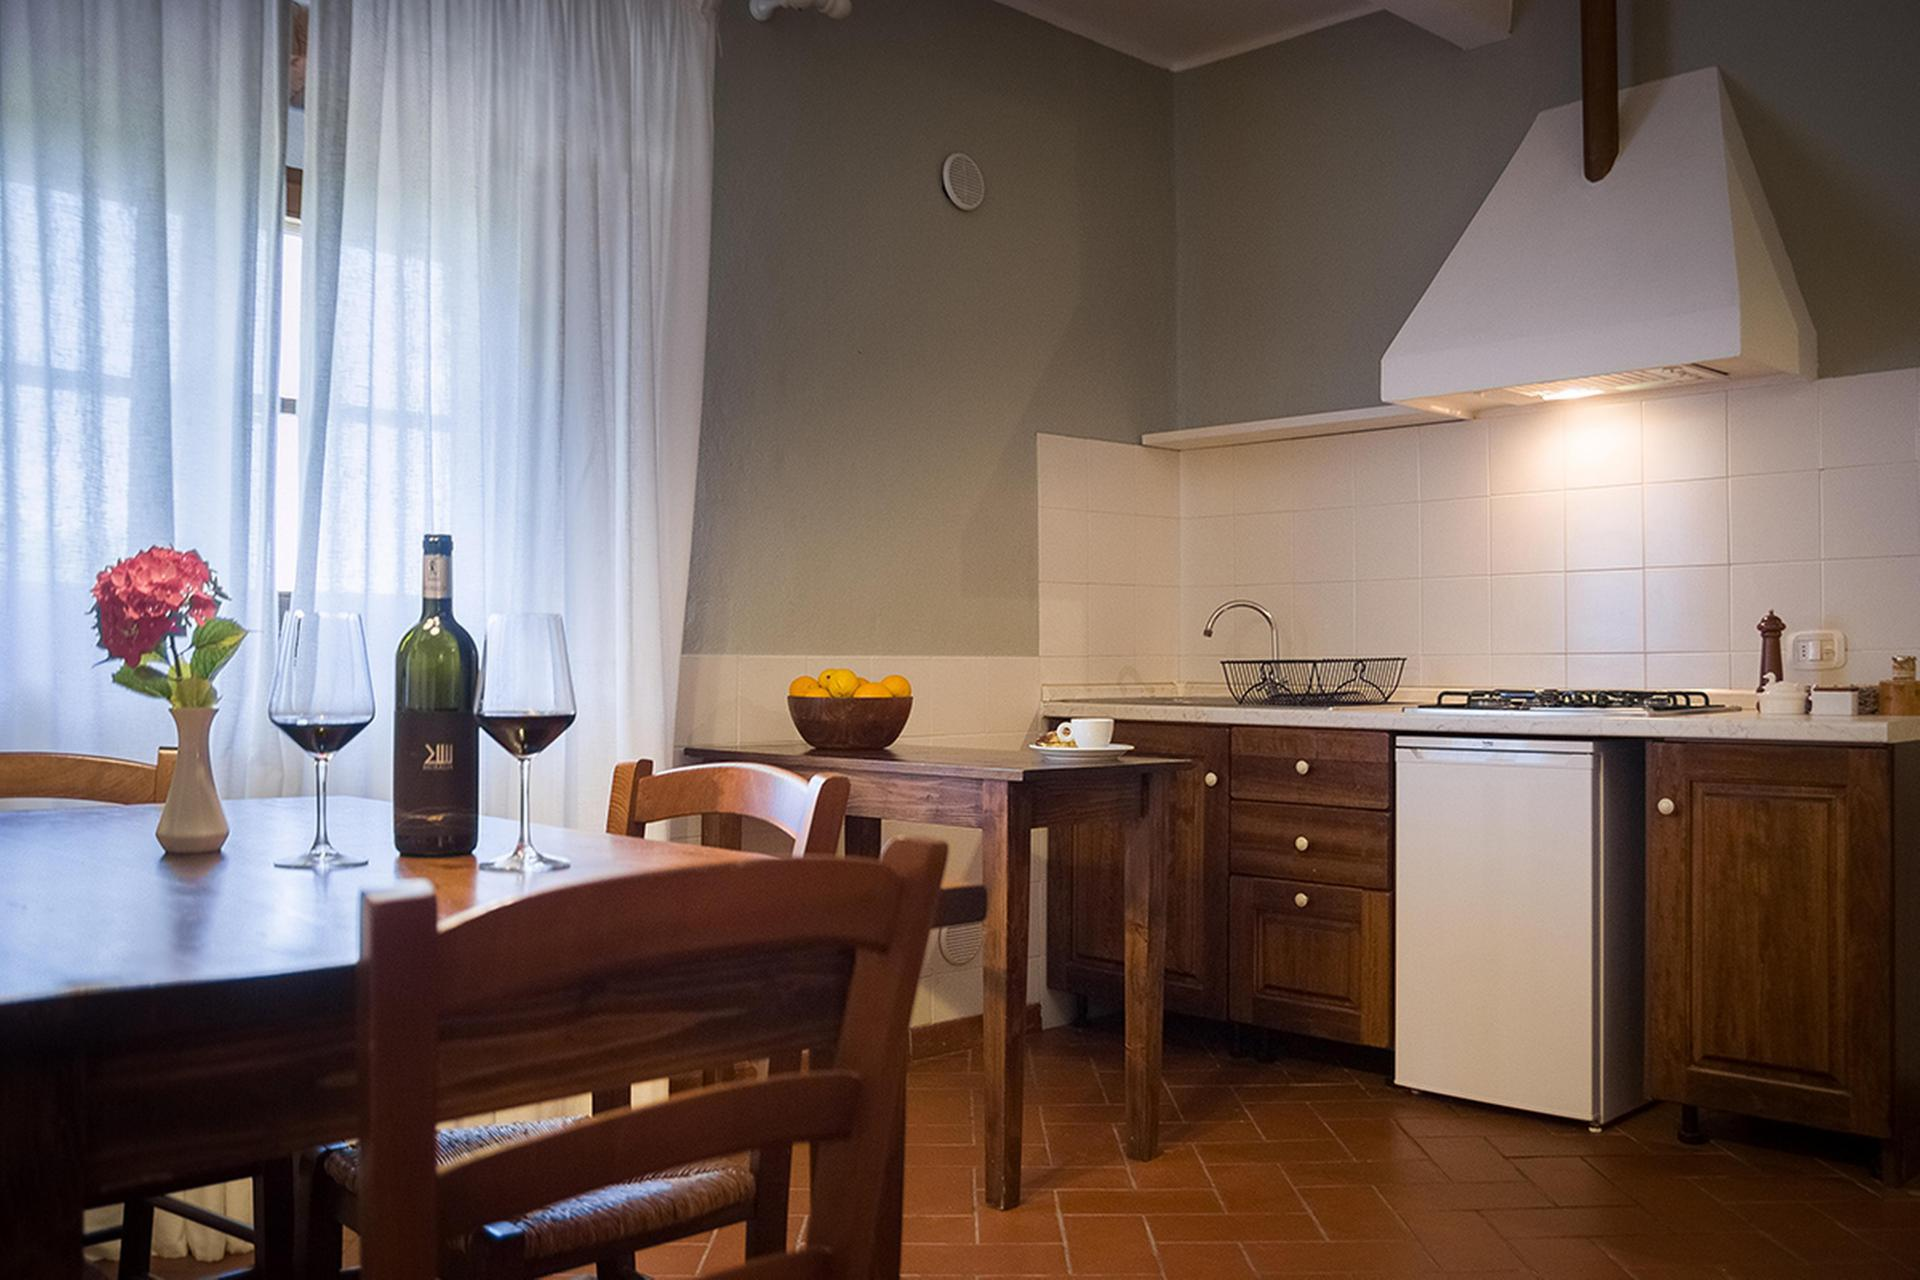 Agriturismo Toskana 10 gemütliche Wohnungen in der Maremma - Toskana   myitalyselection.de